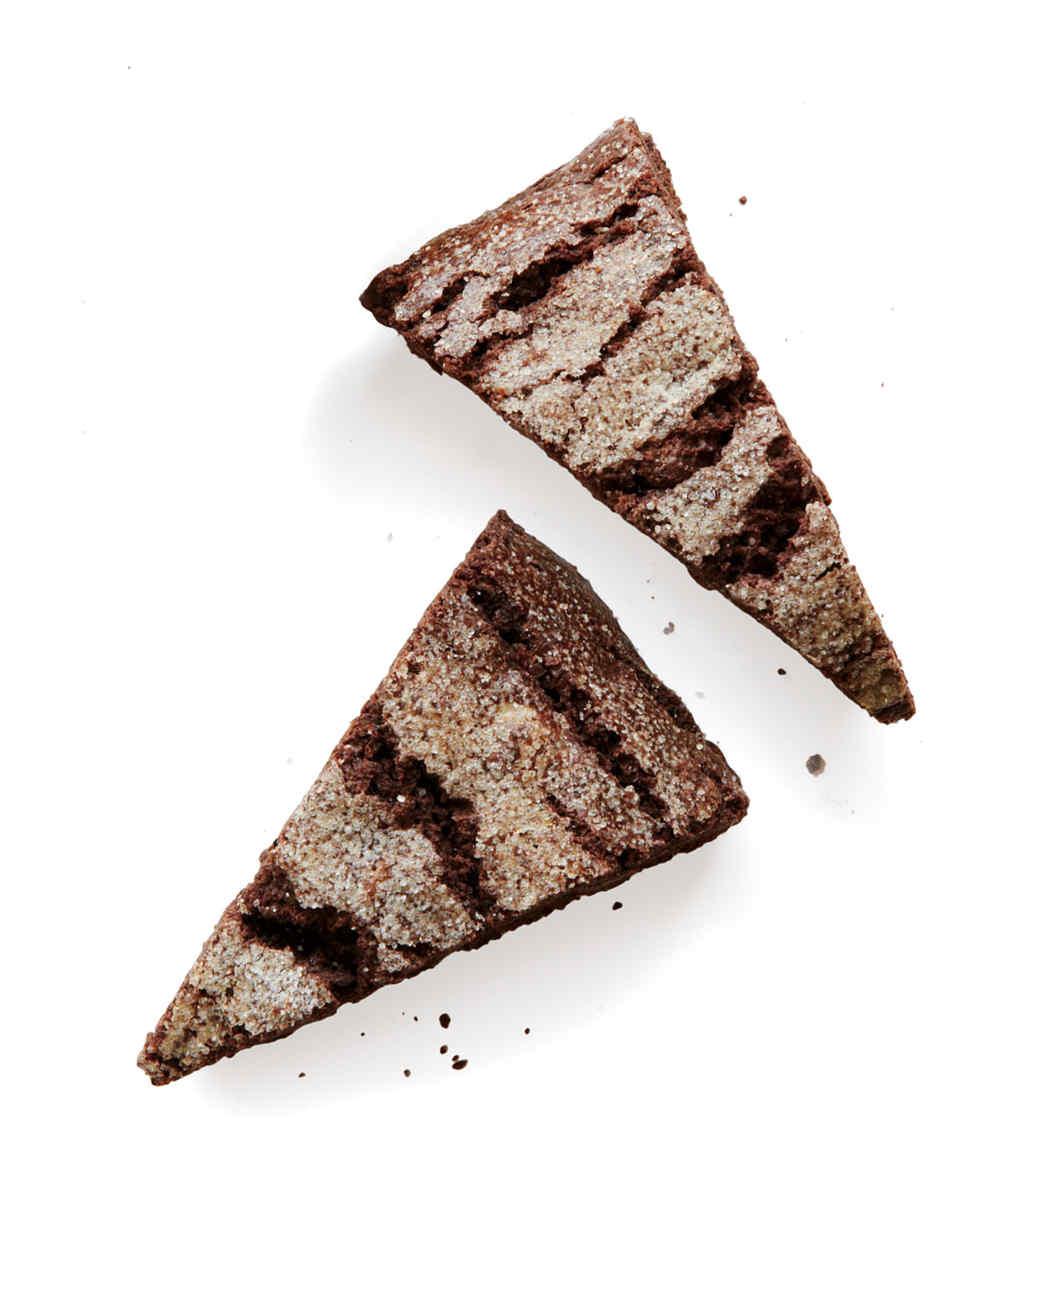 chocolate-chicory-logs-mld107826.jpg